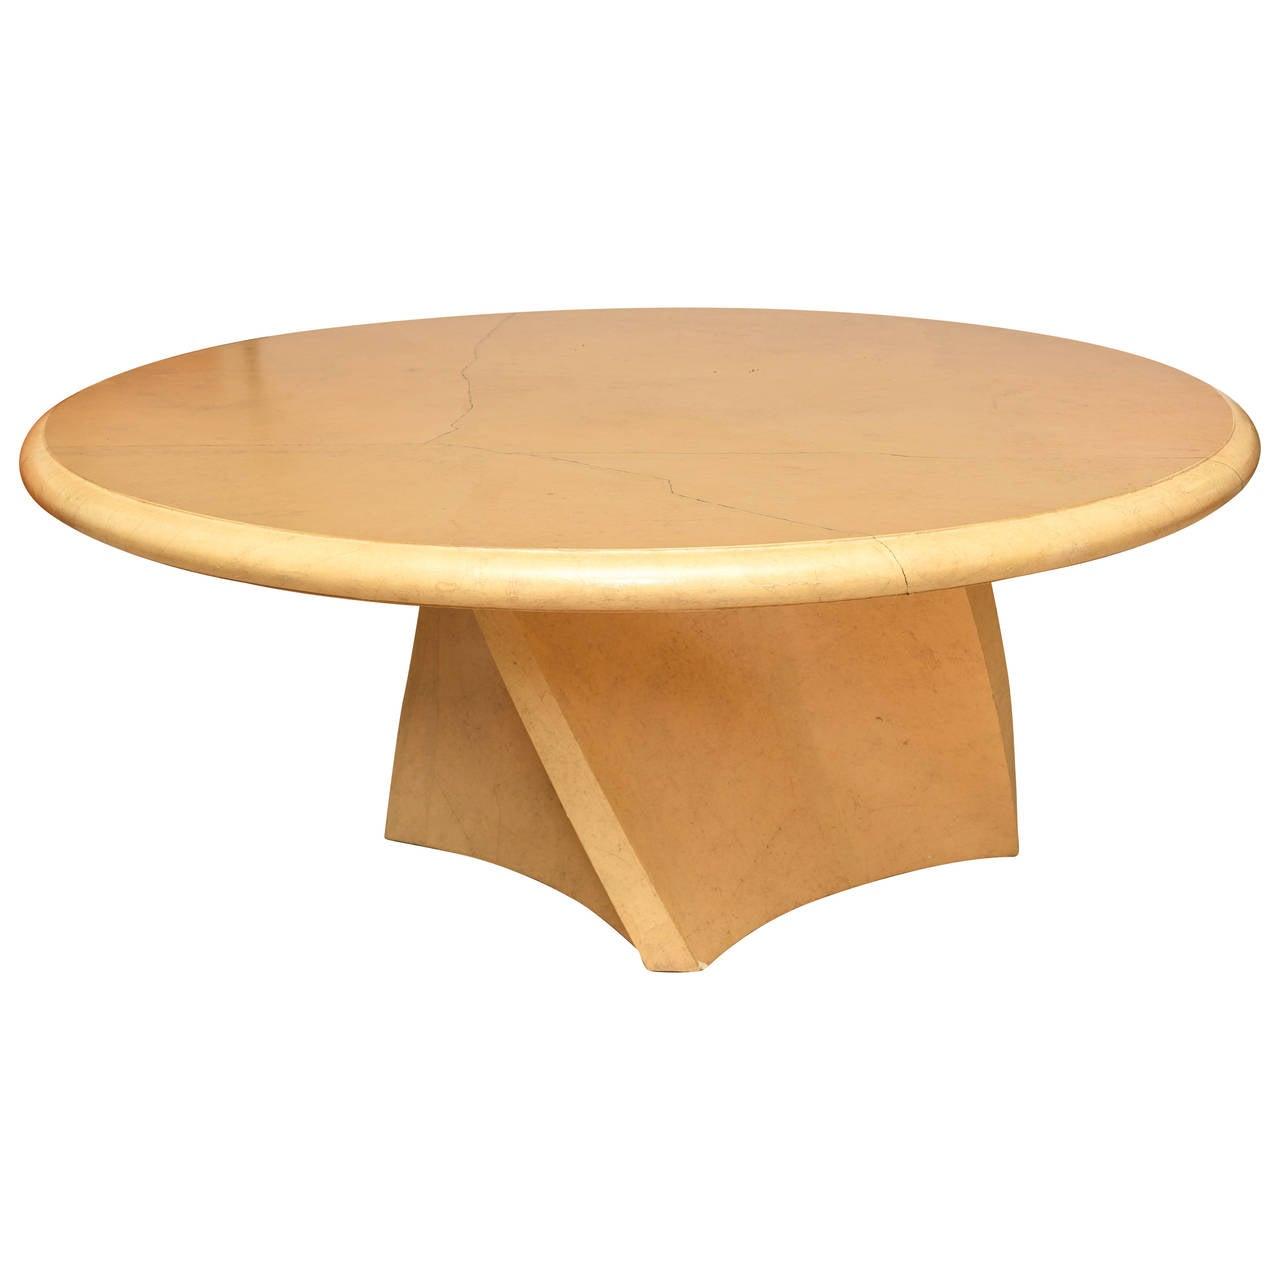 "Large American Modern Circular ""Goatskin"" Dining Table in Karl Springer Style"